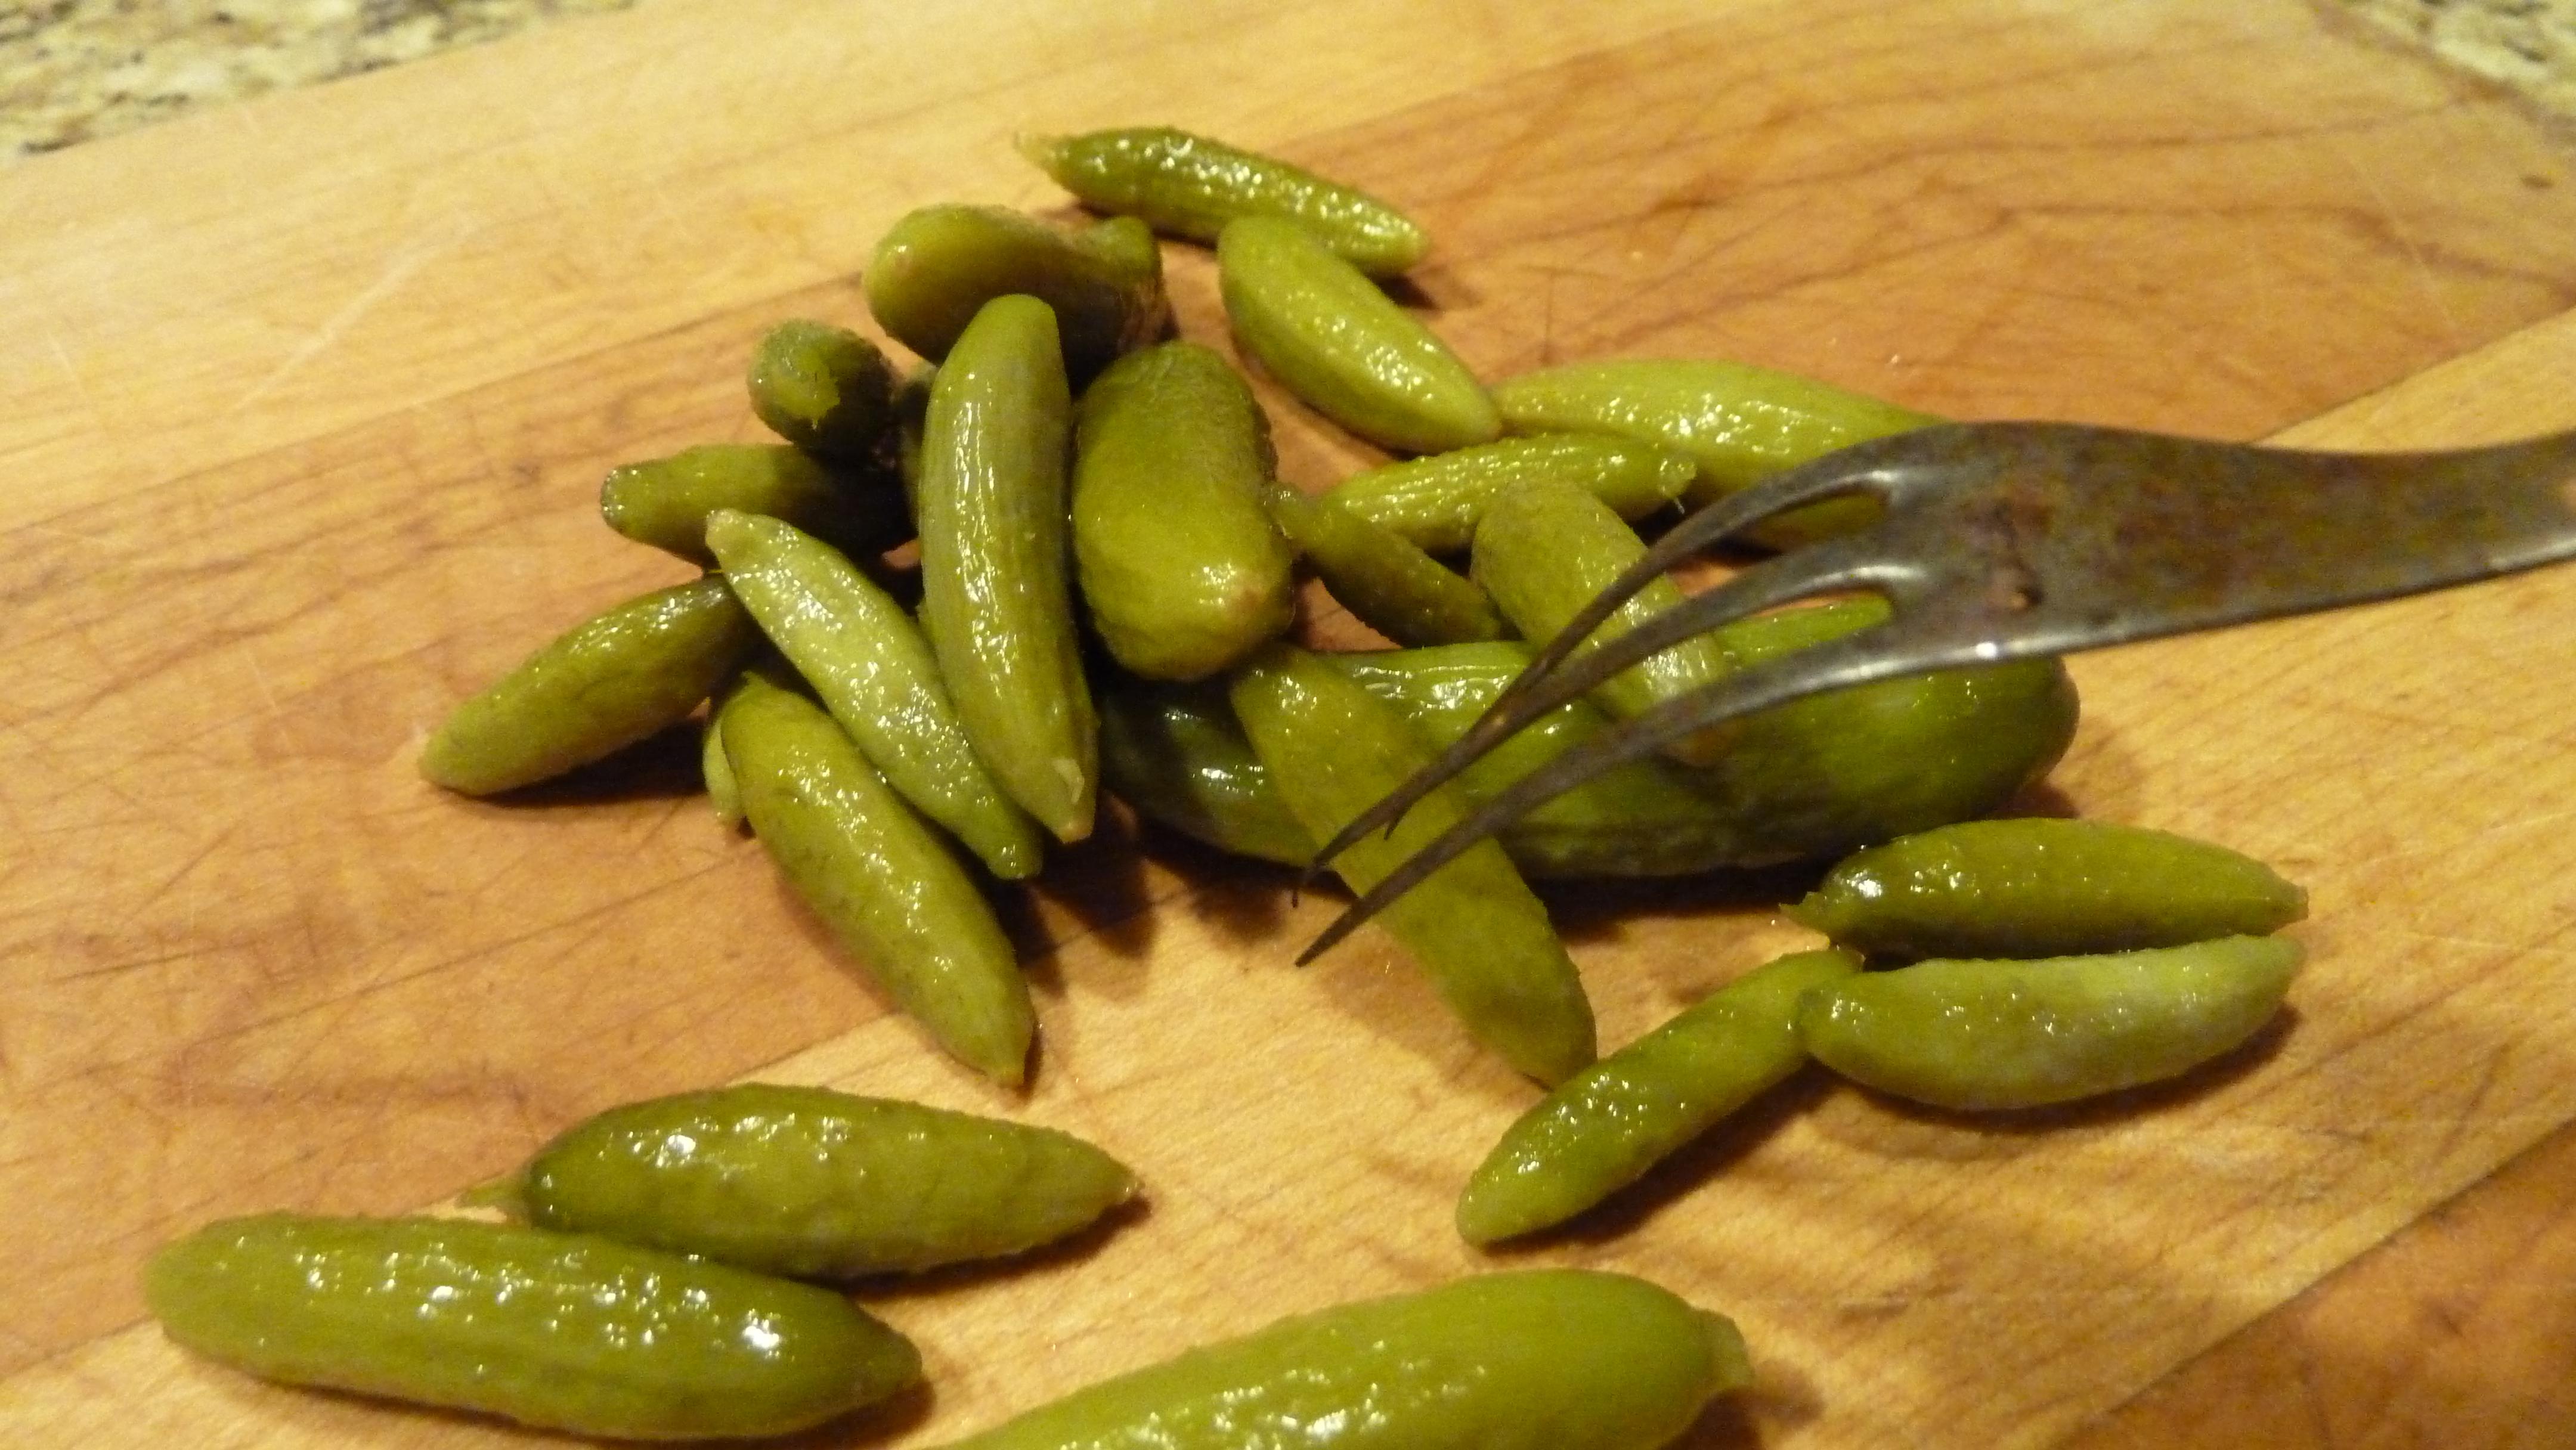 midget sweet pickle gherkin